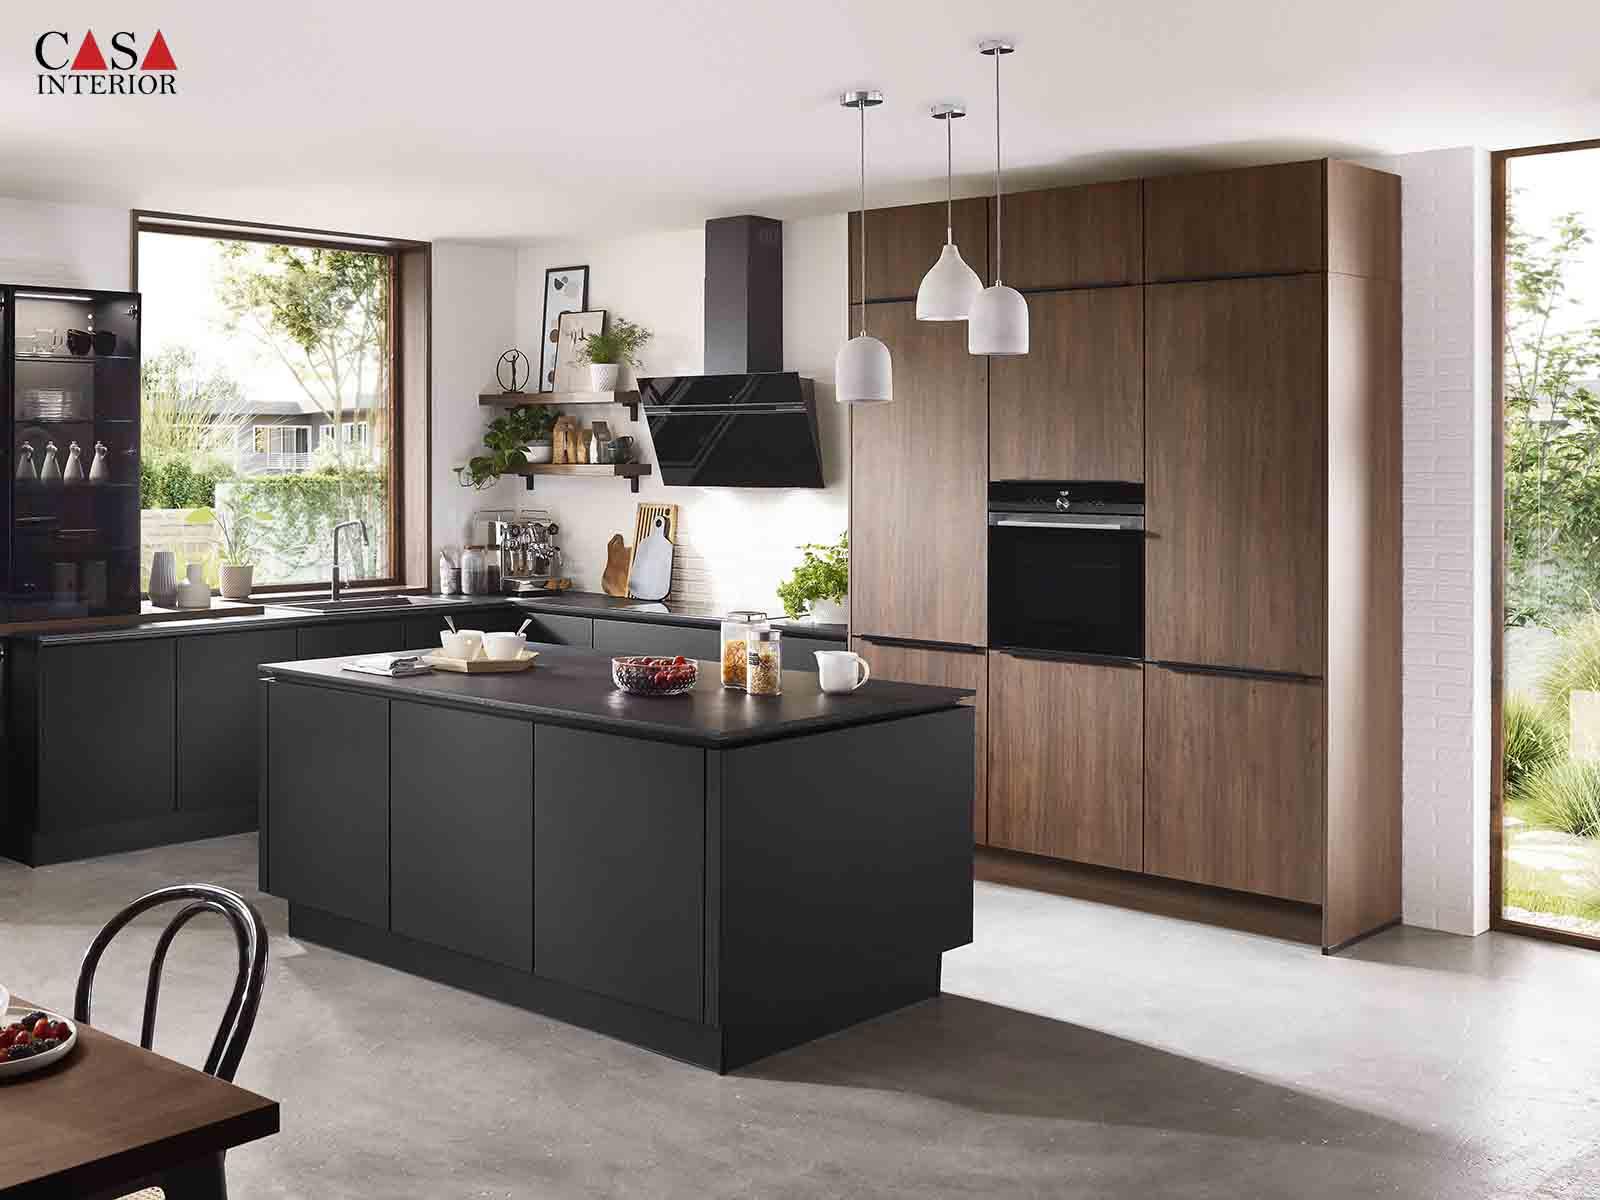 Küchentime Riva 840 Line N